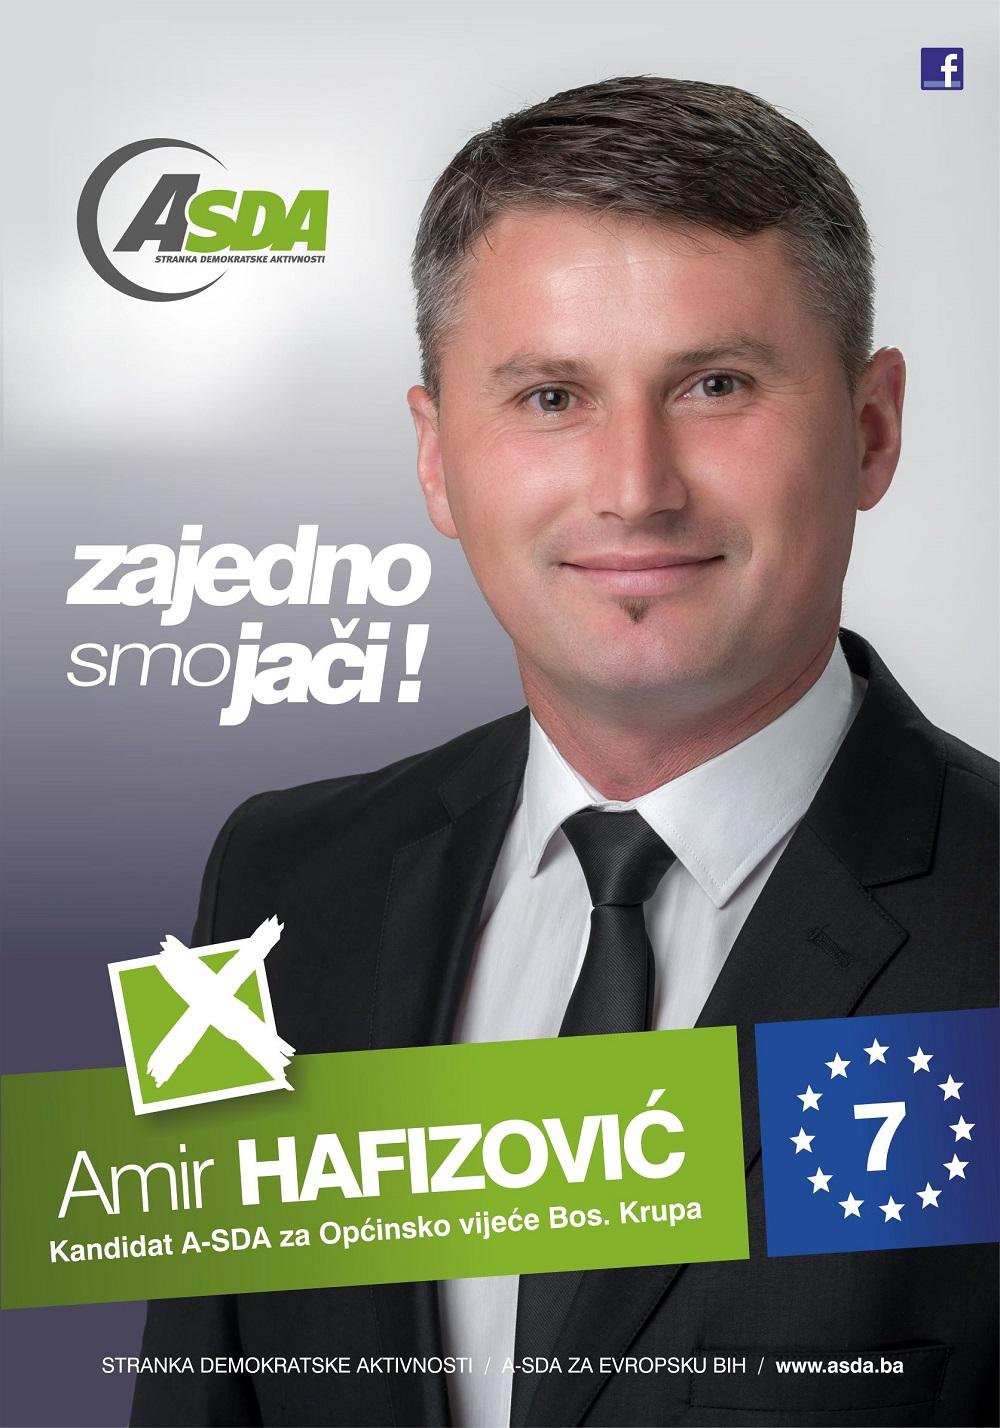 Amir Hafizović